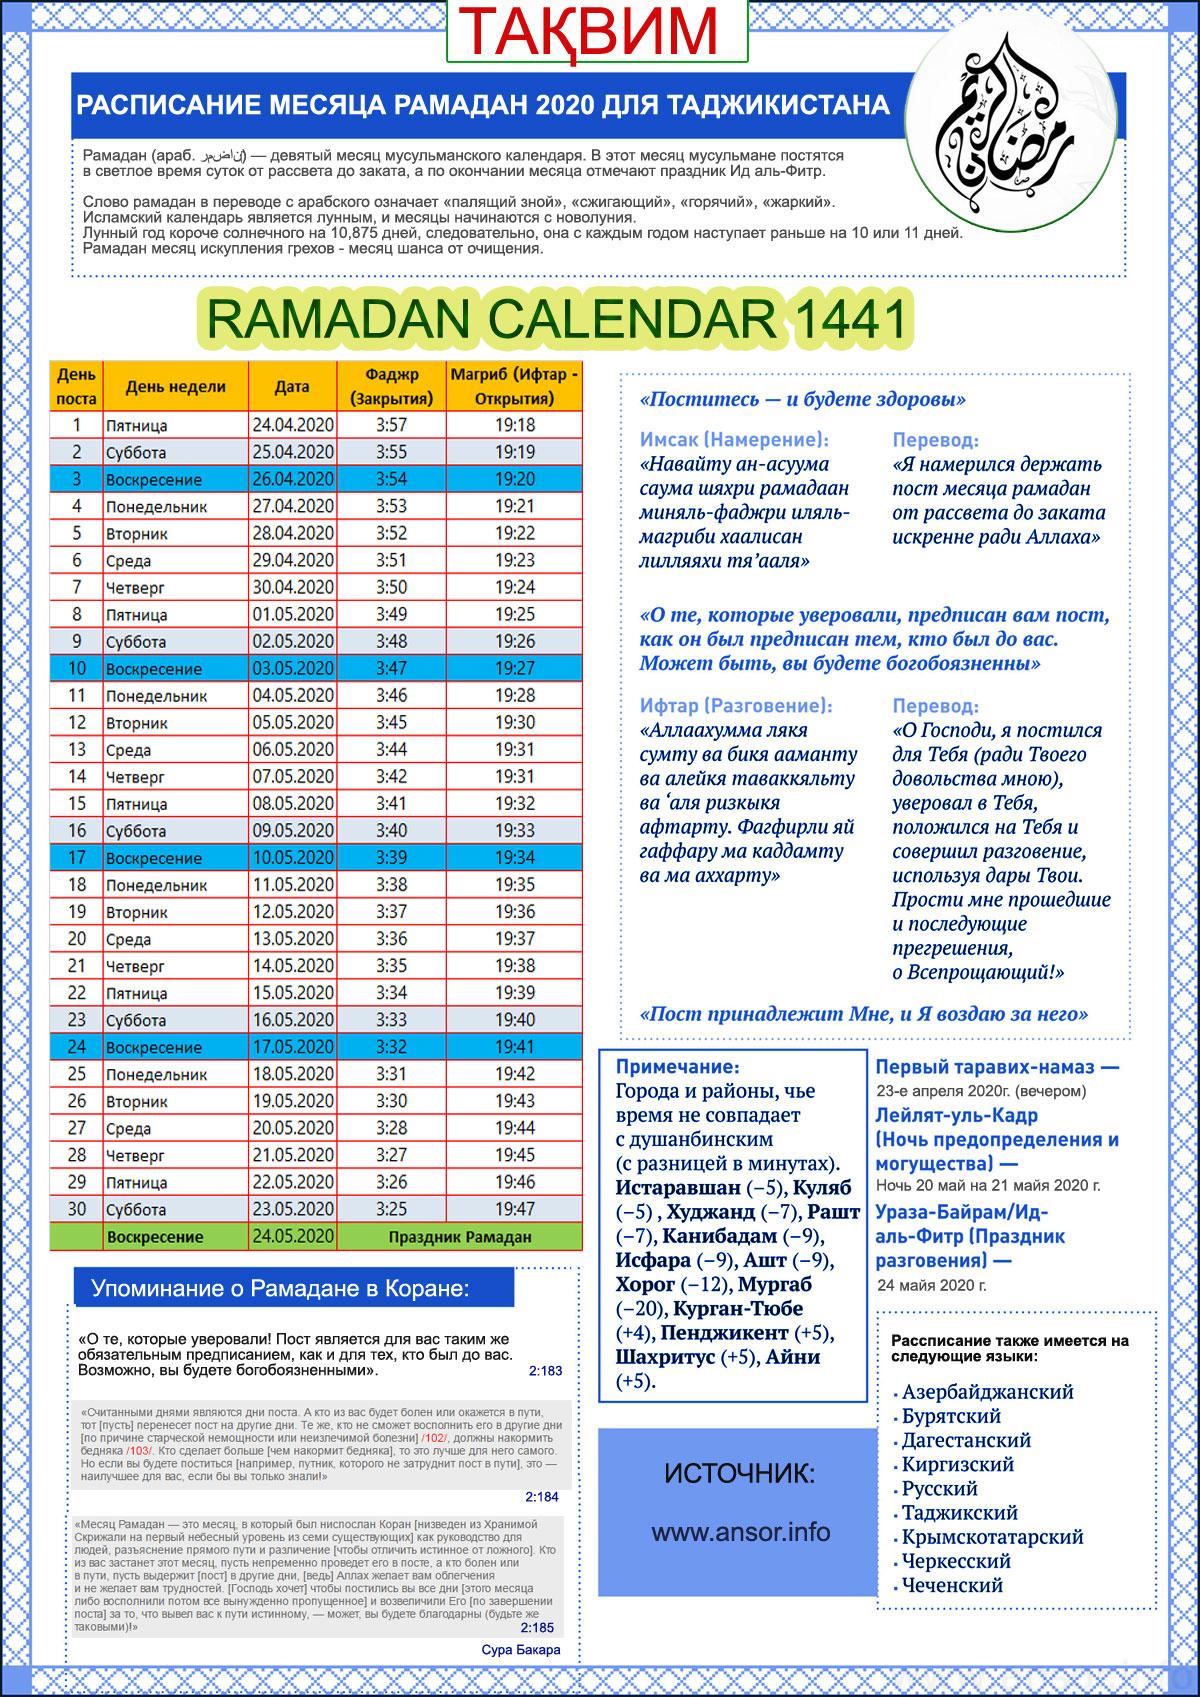 Рамадан Таджикистан Расписание, Календарь 2020